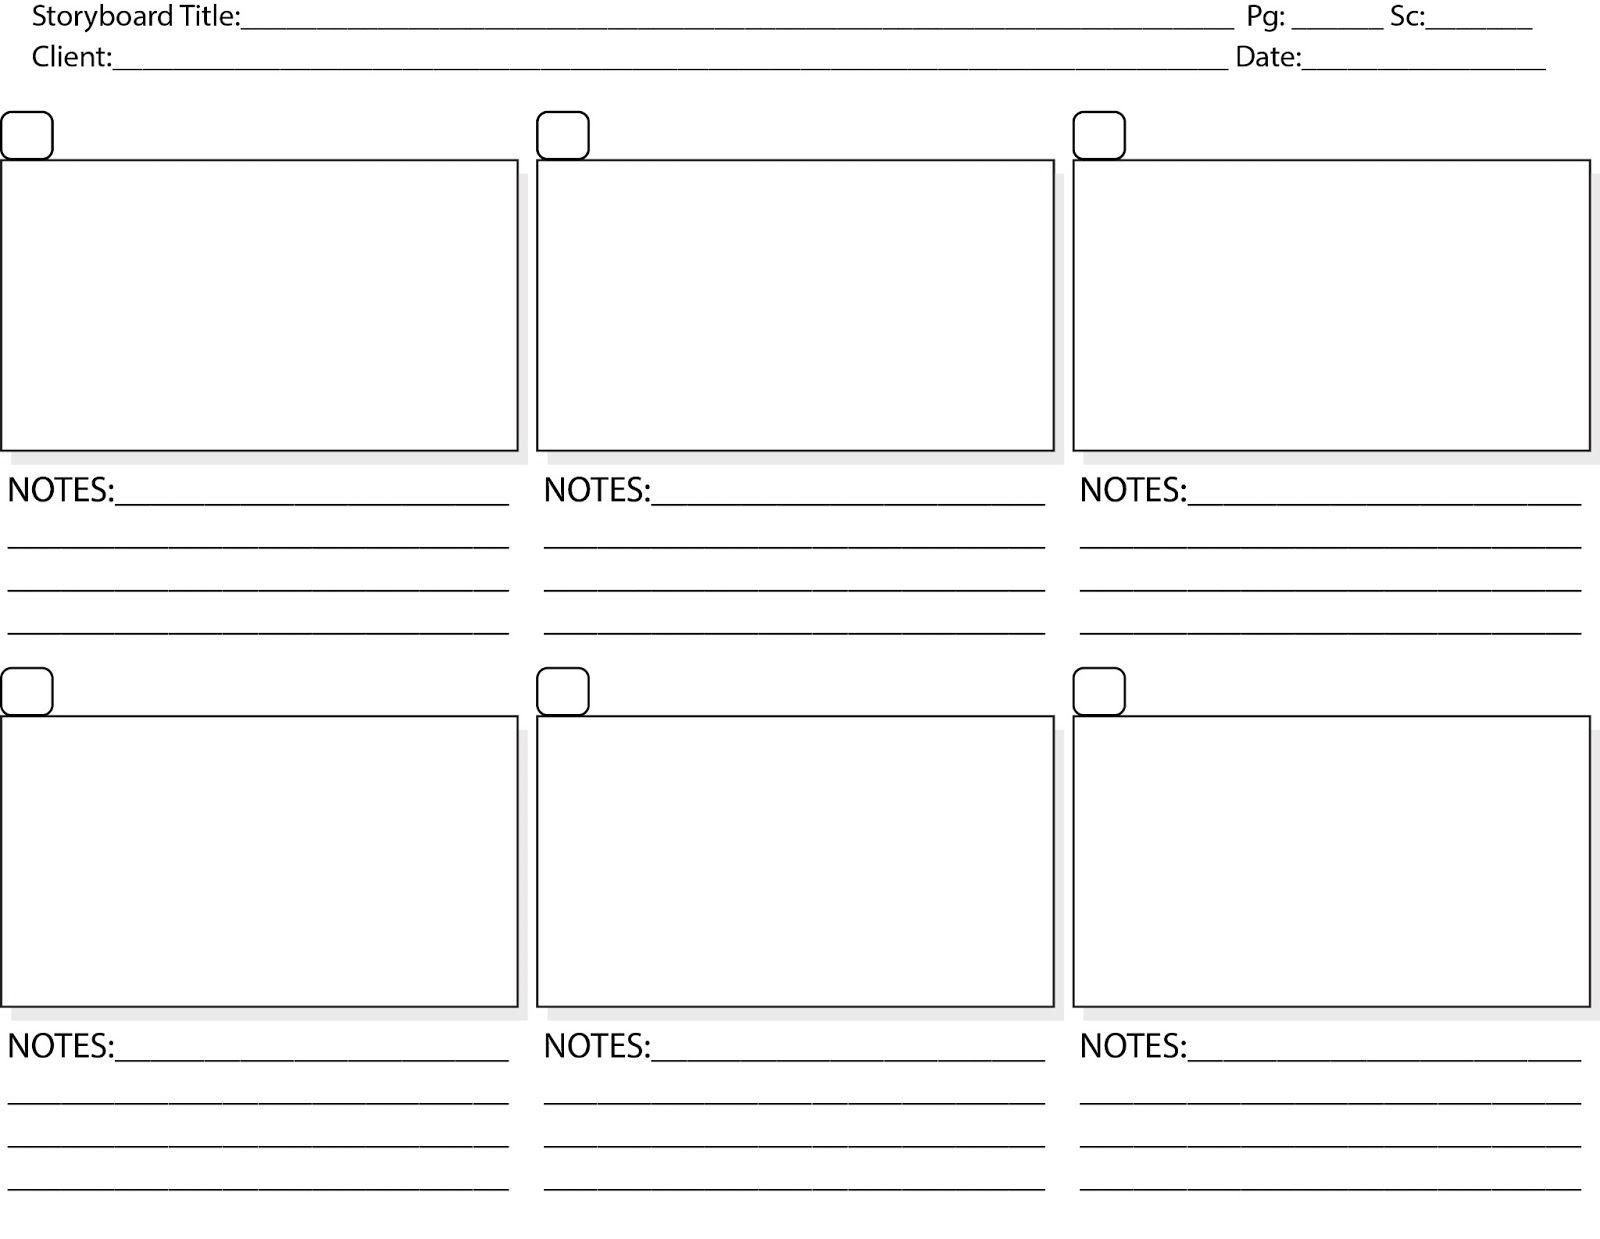 Storyboard Template Print Storyboard Tem